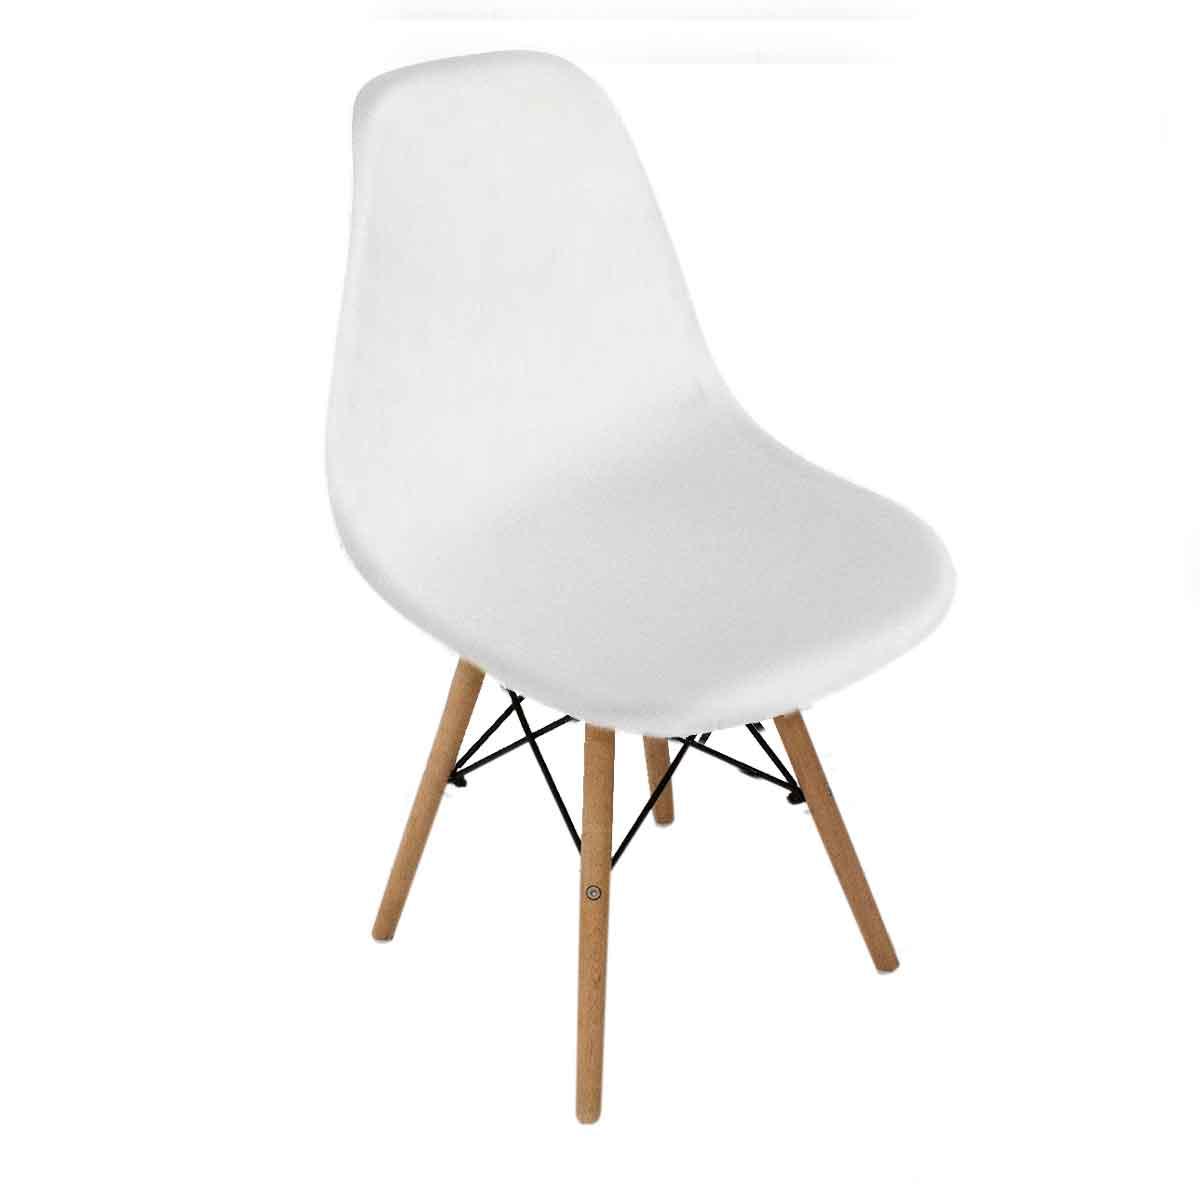 Cadeira Charles Eames Wood Design Branco Fosco Base Madeira